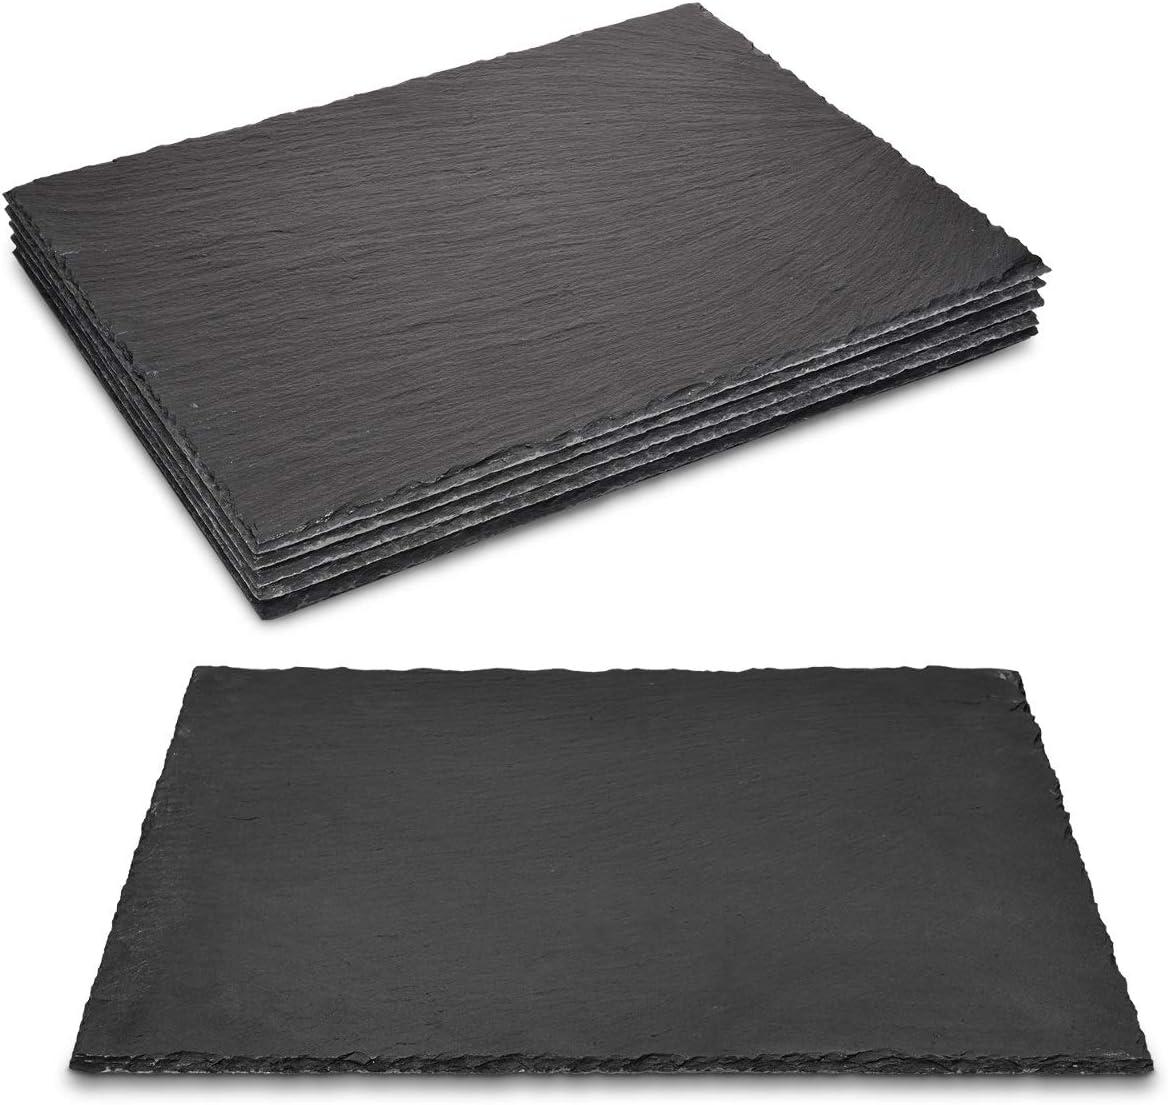 38 x 28 cm Navaris Natural Slate Serving Plates Large Rectangular Stone Table Mat Serving Platter Tiles Set of 6 Slate Place Mat Serving Trays